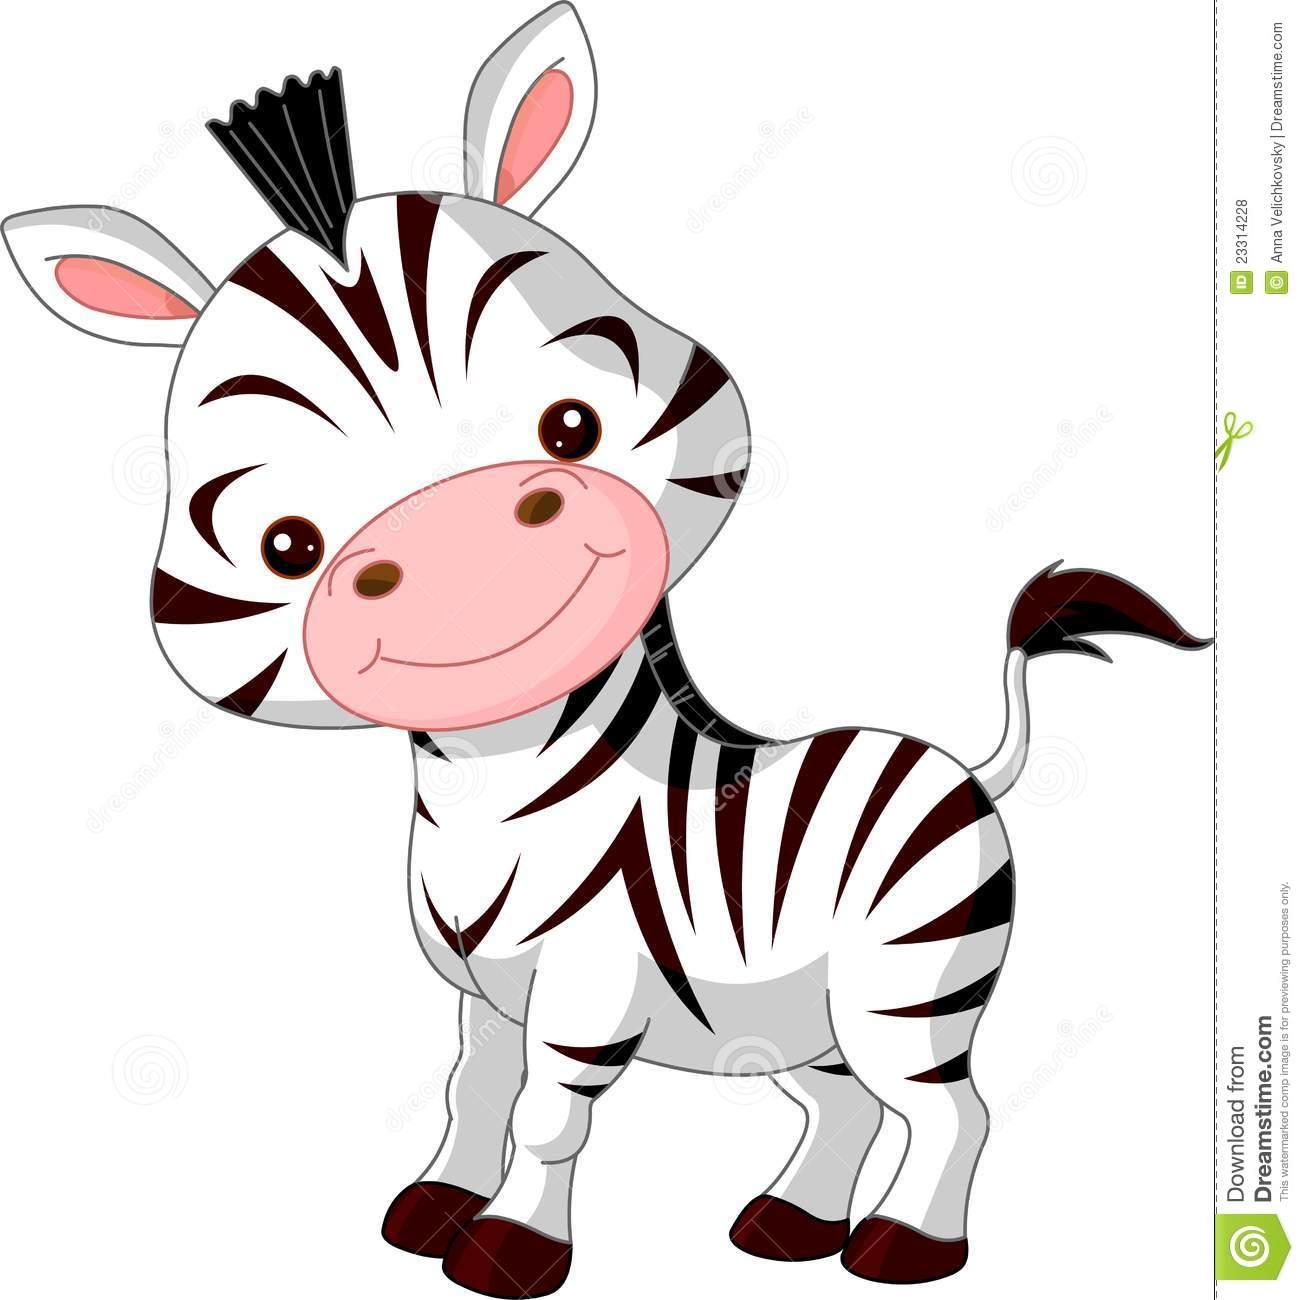 cute baby zebra clipart at getdrawings com free for personal use rh getdrawings com cute zebra clipart